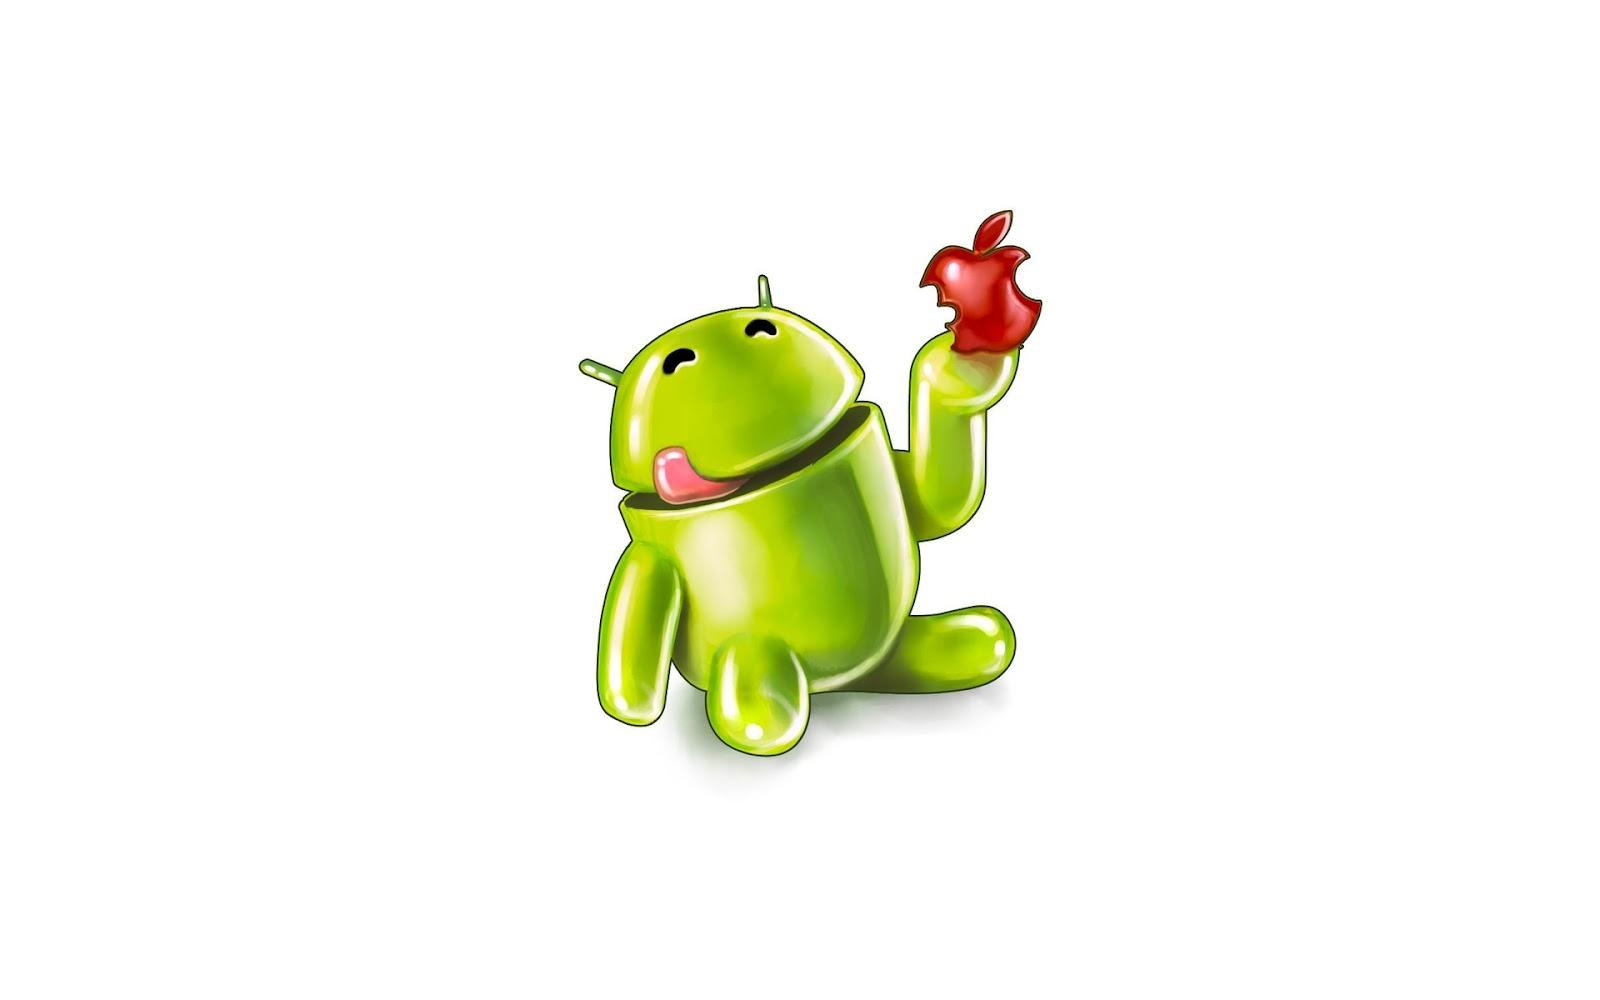 Free-Art-Tech: Android vs Apple wallpaper